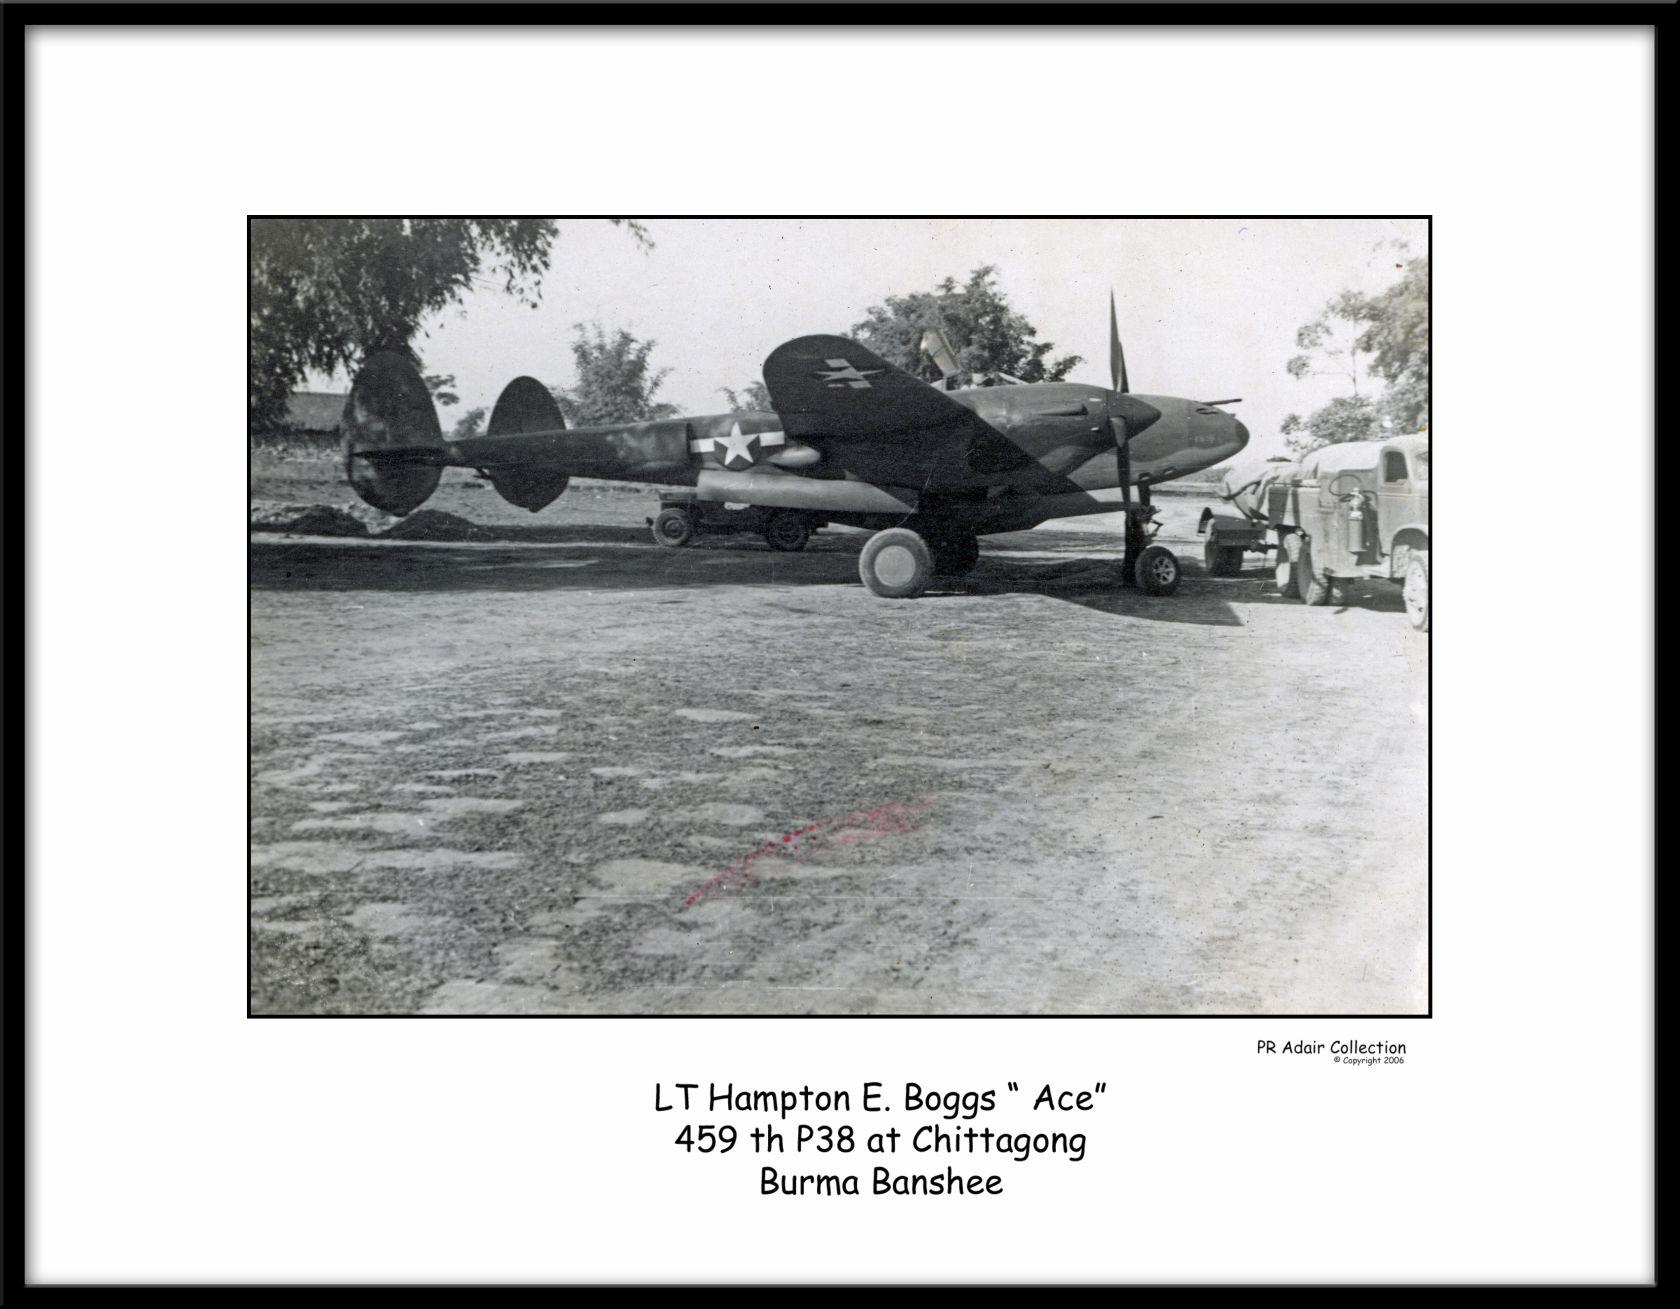 Burma Banshee 116